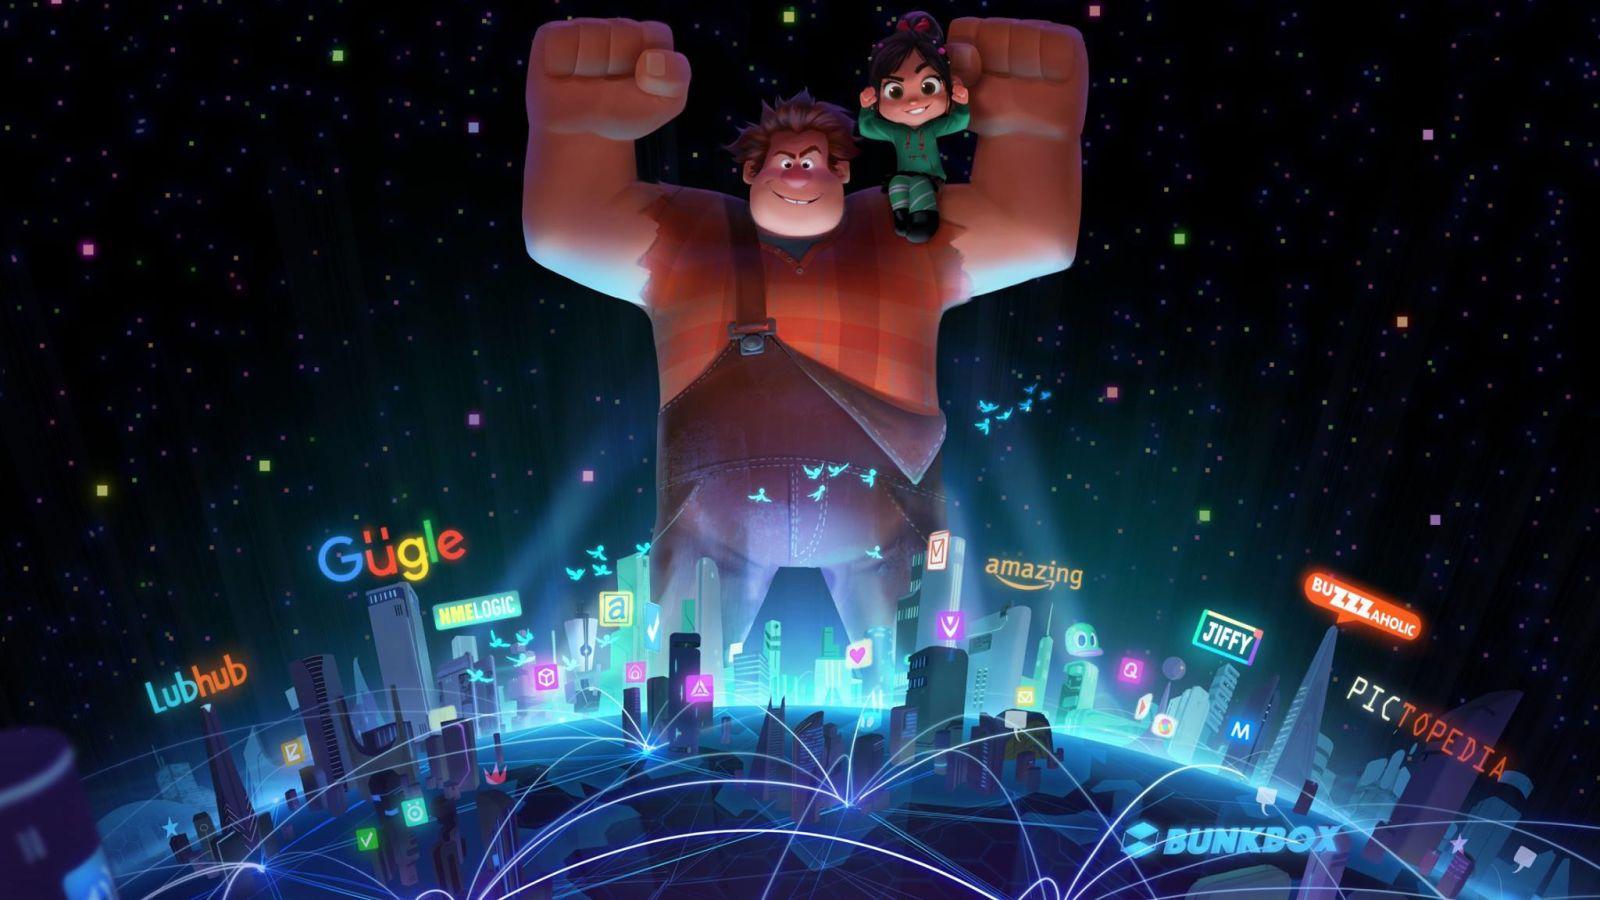 Wreck It Ralph 2, Sequel, Ralph Breaks The Internet, Animated Movie, Pixar, Disney